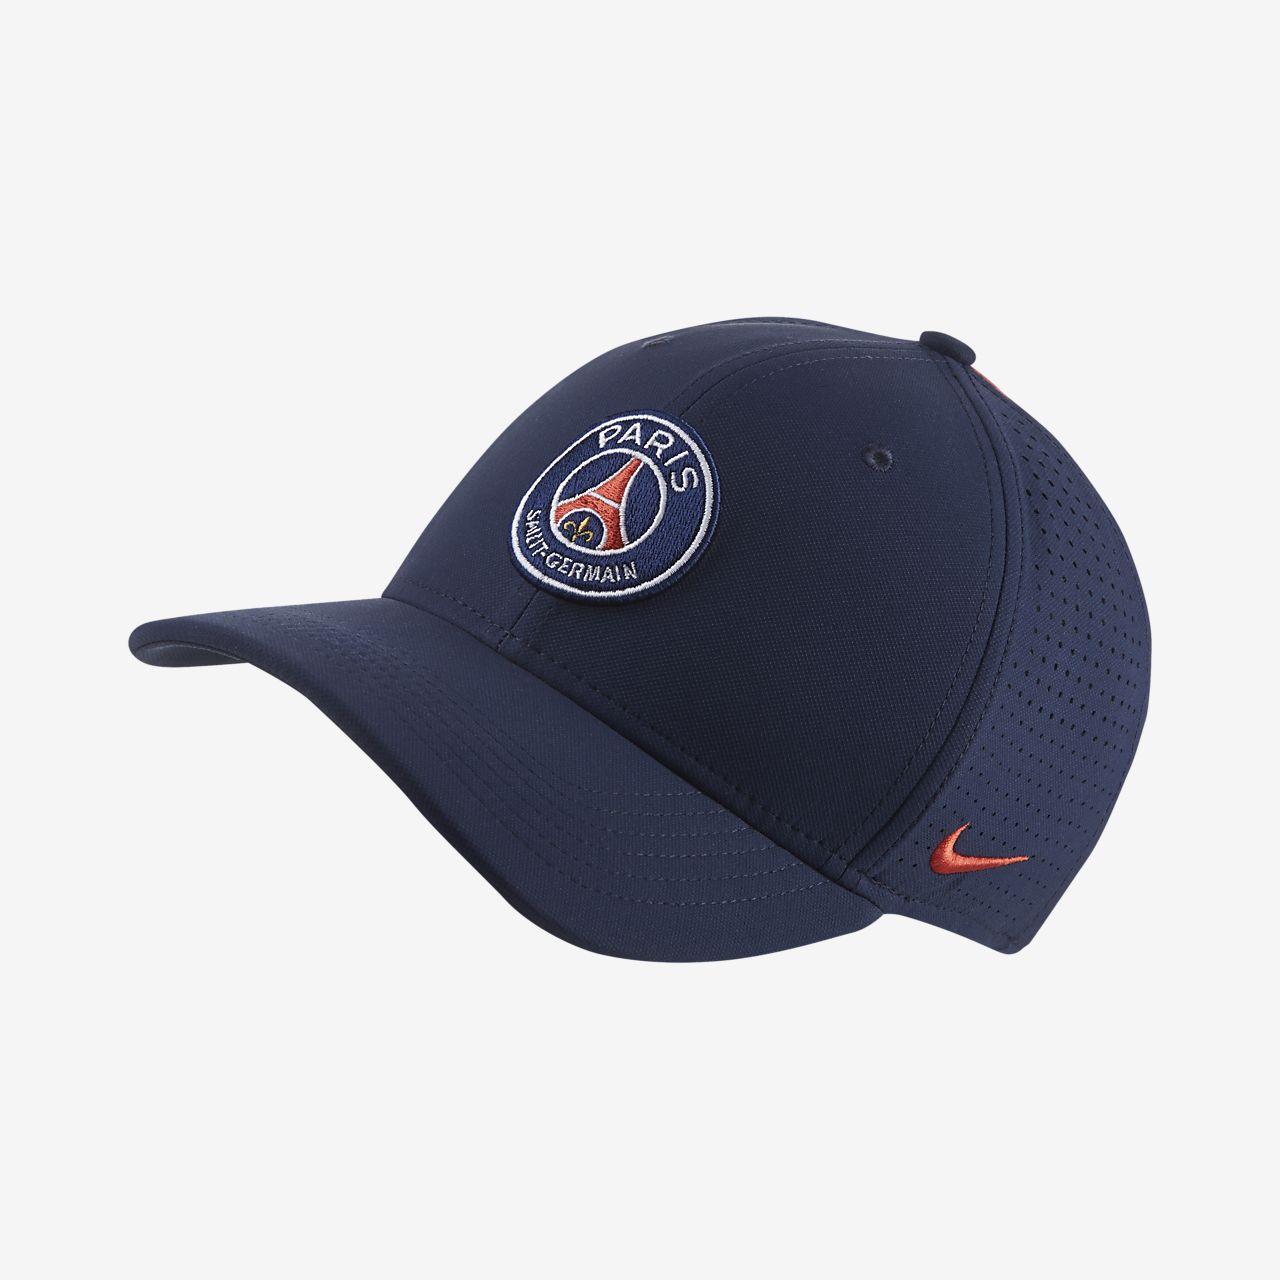 ... Paris Saint-Germain AeroBill Classic99 Adjustable Hat